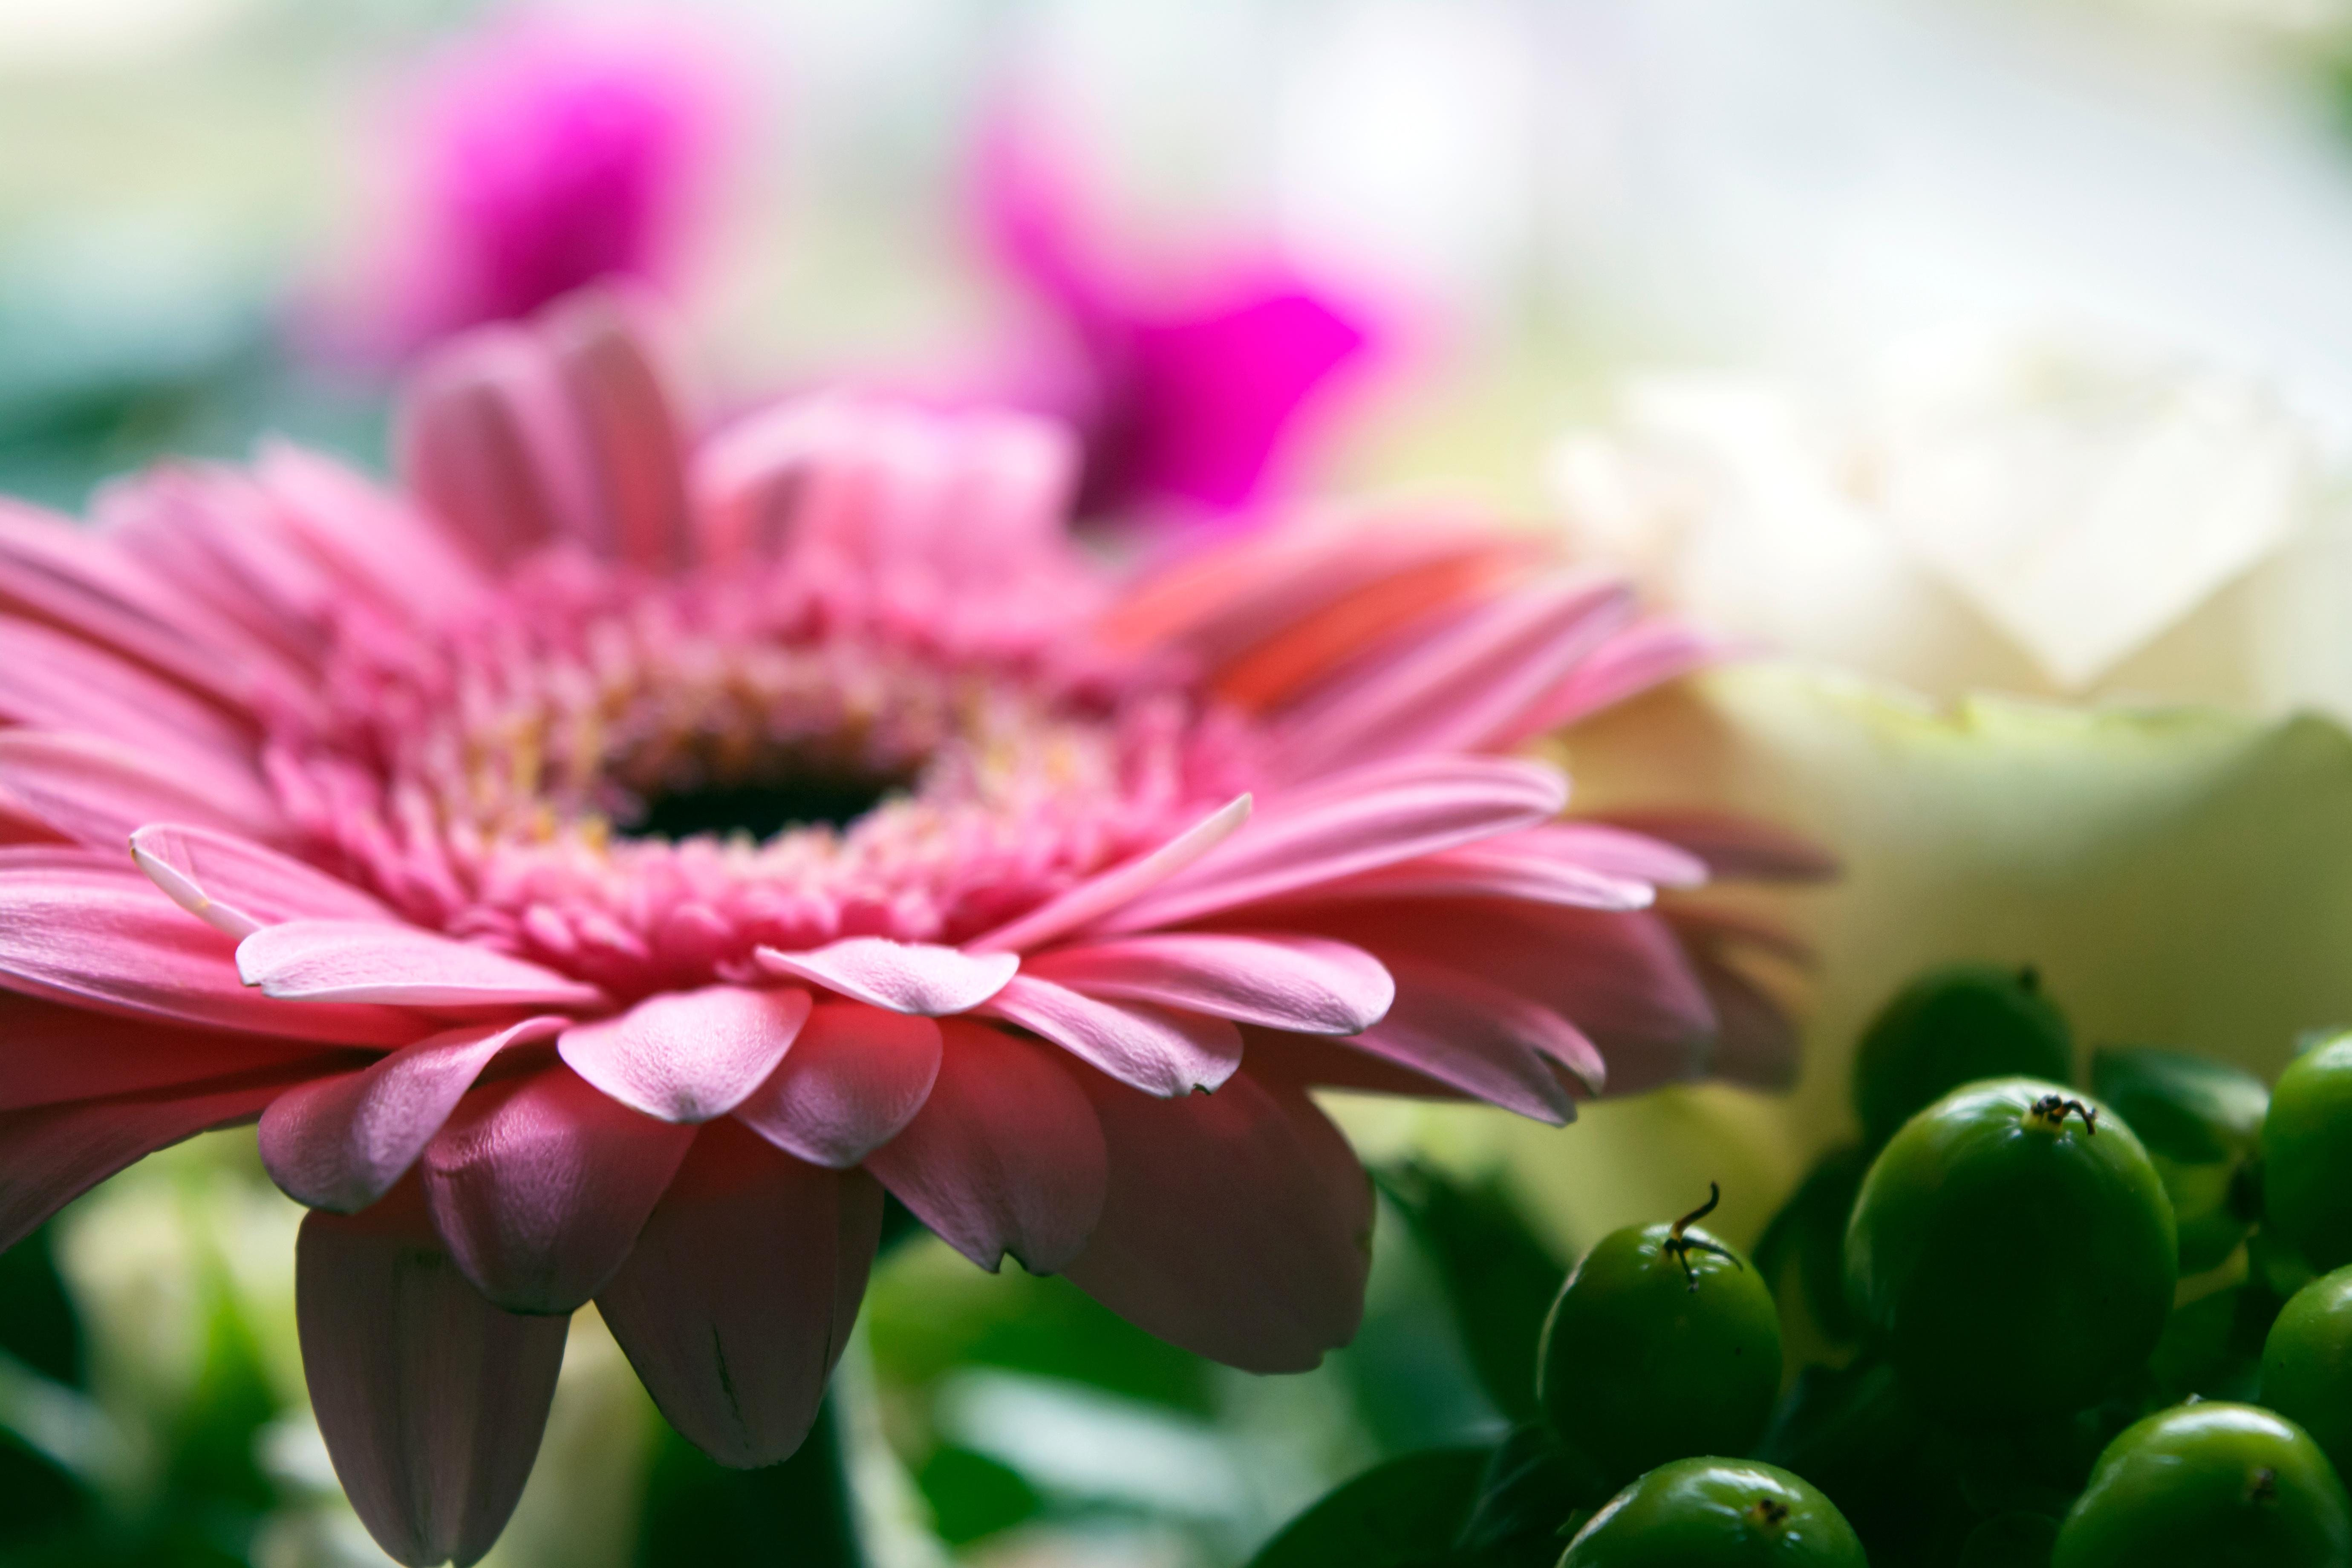 images gratuites fleur p tale marguerite rose flore fermer gerbera fleuriste. Black Bedroom Furniture Sets. Home Design Ideas